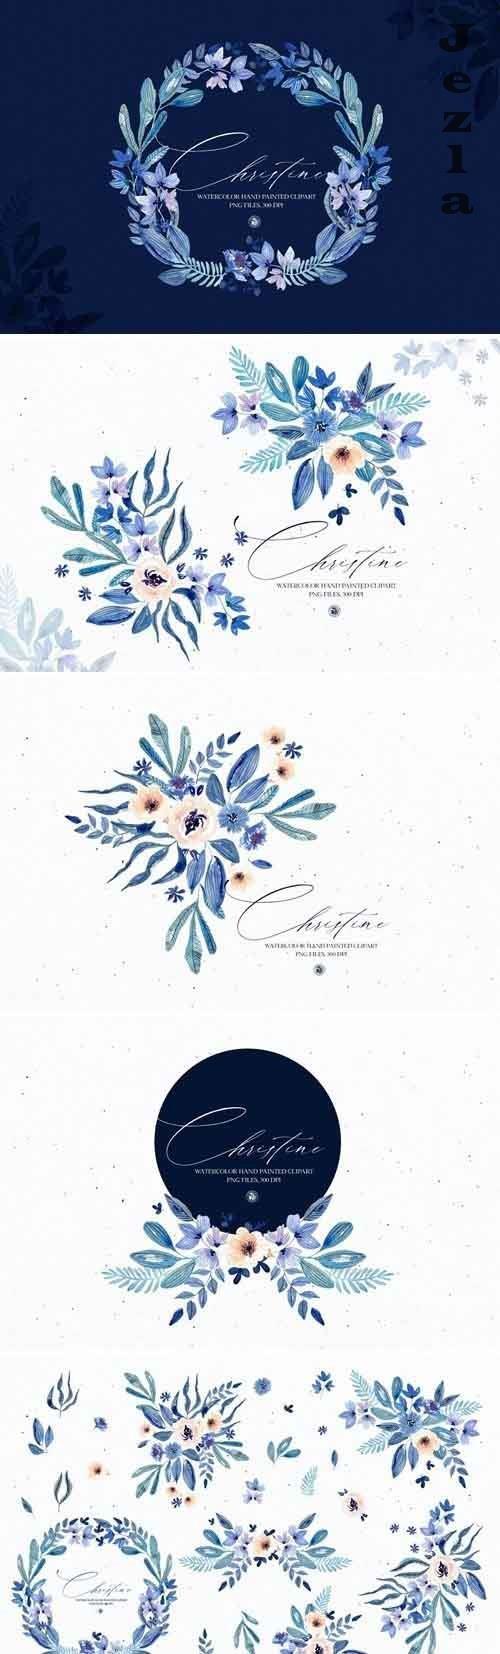 Watercolor floral set - Christine - 5503082